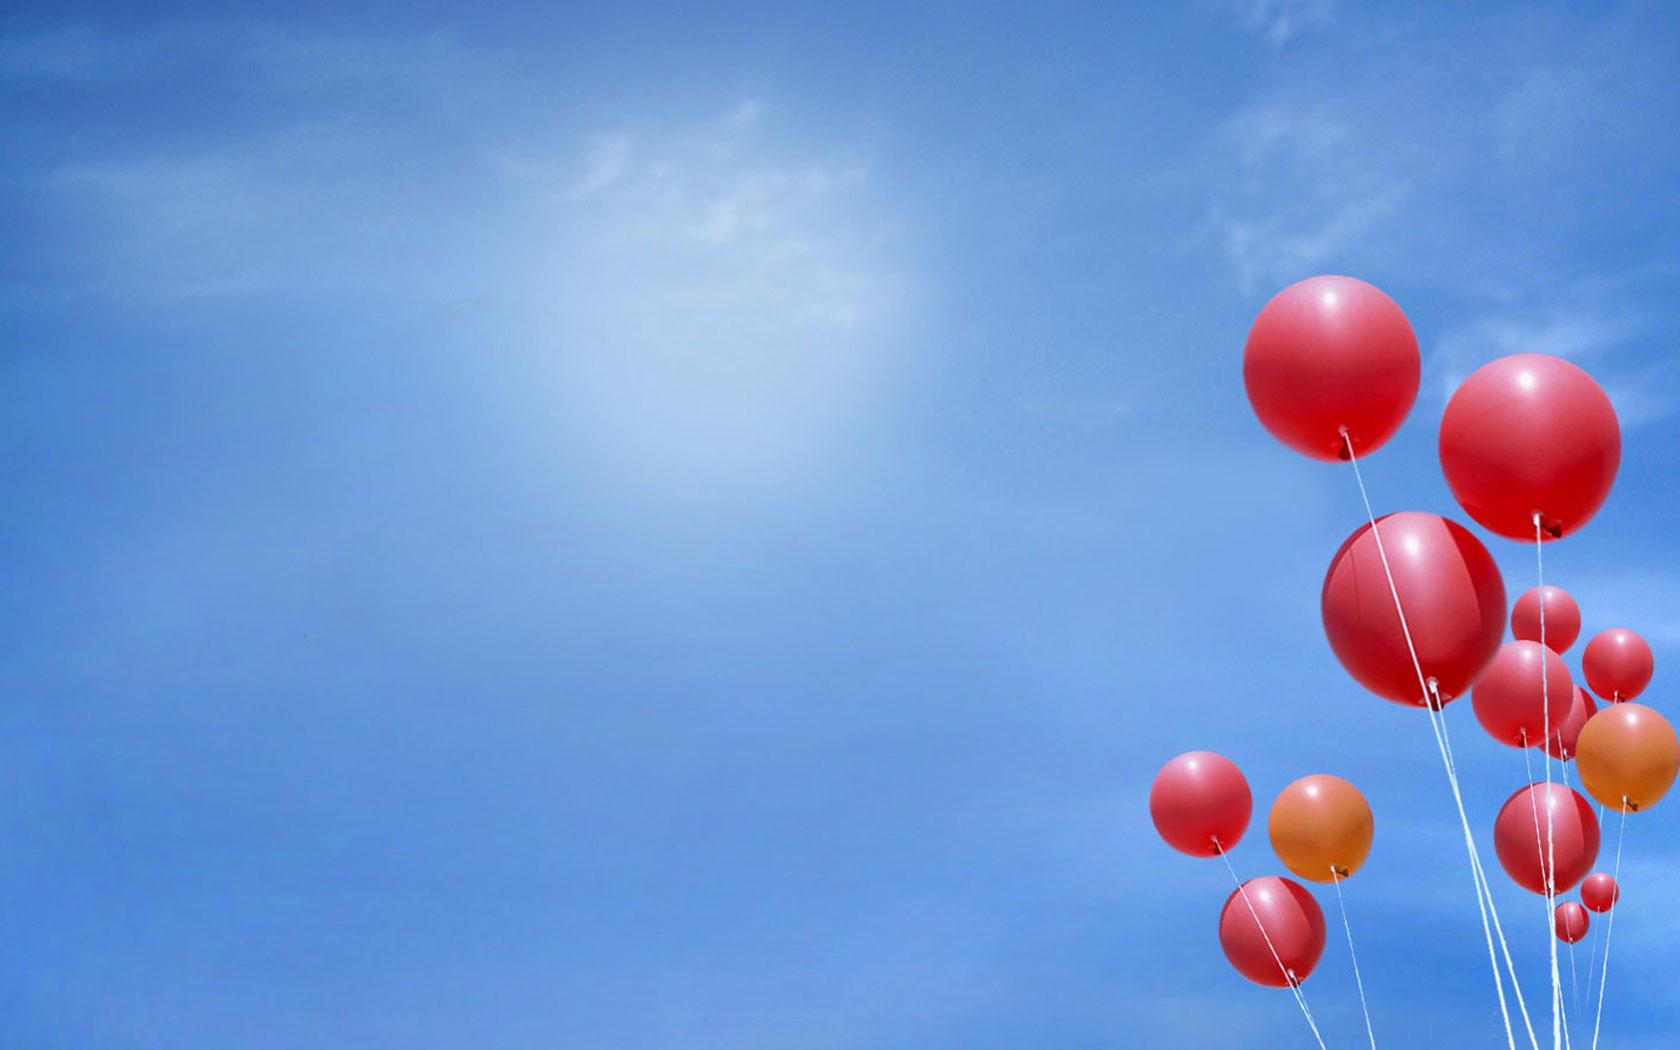 The hydrogen balloon close up wallpaper Auto desktop background 1680x1050